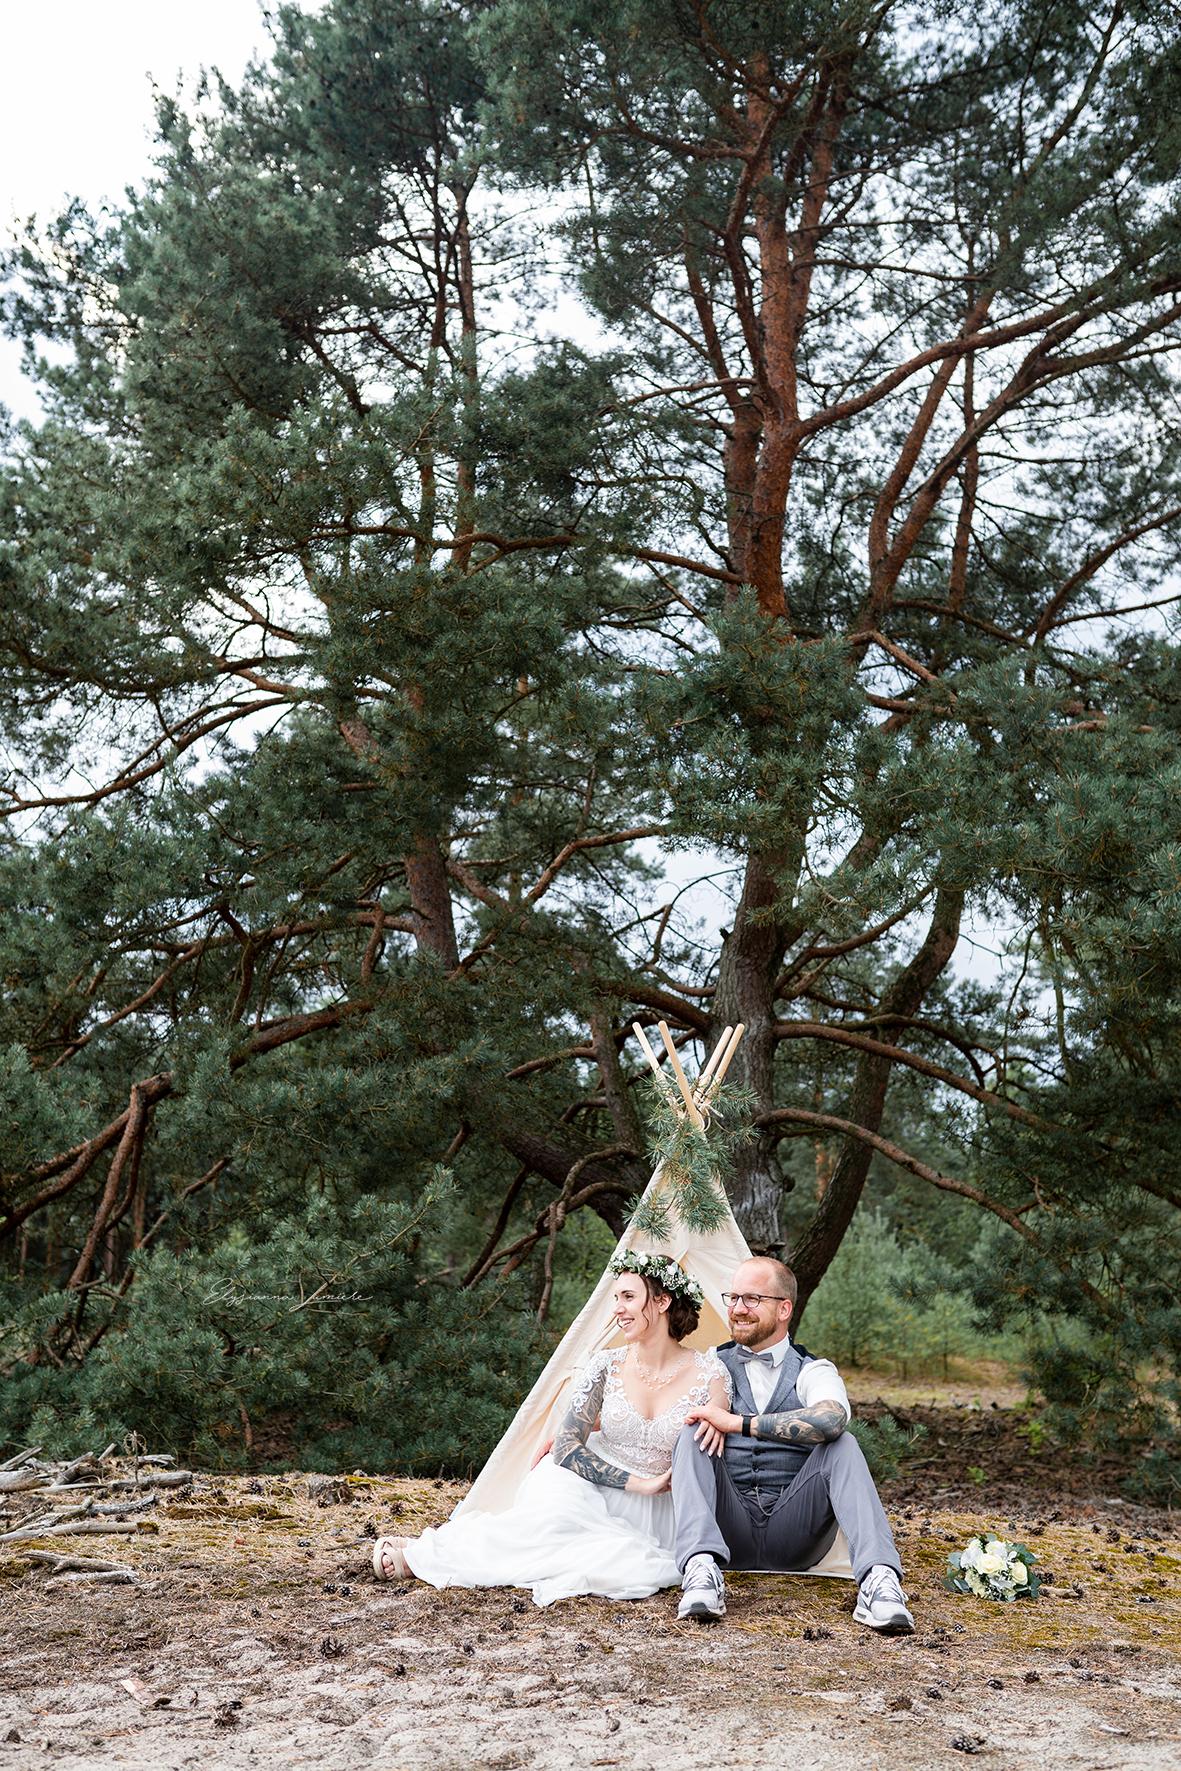 Hochzeitsfotograf Rotenburg Wümme Bohoshooting